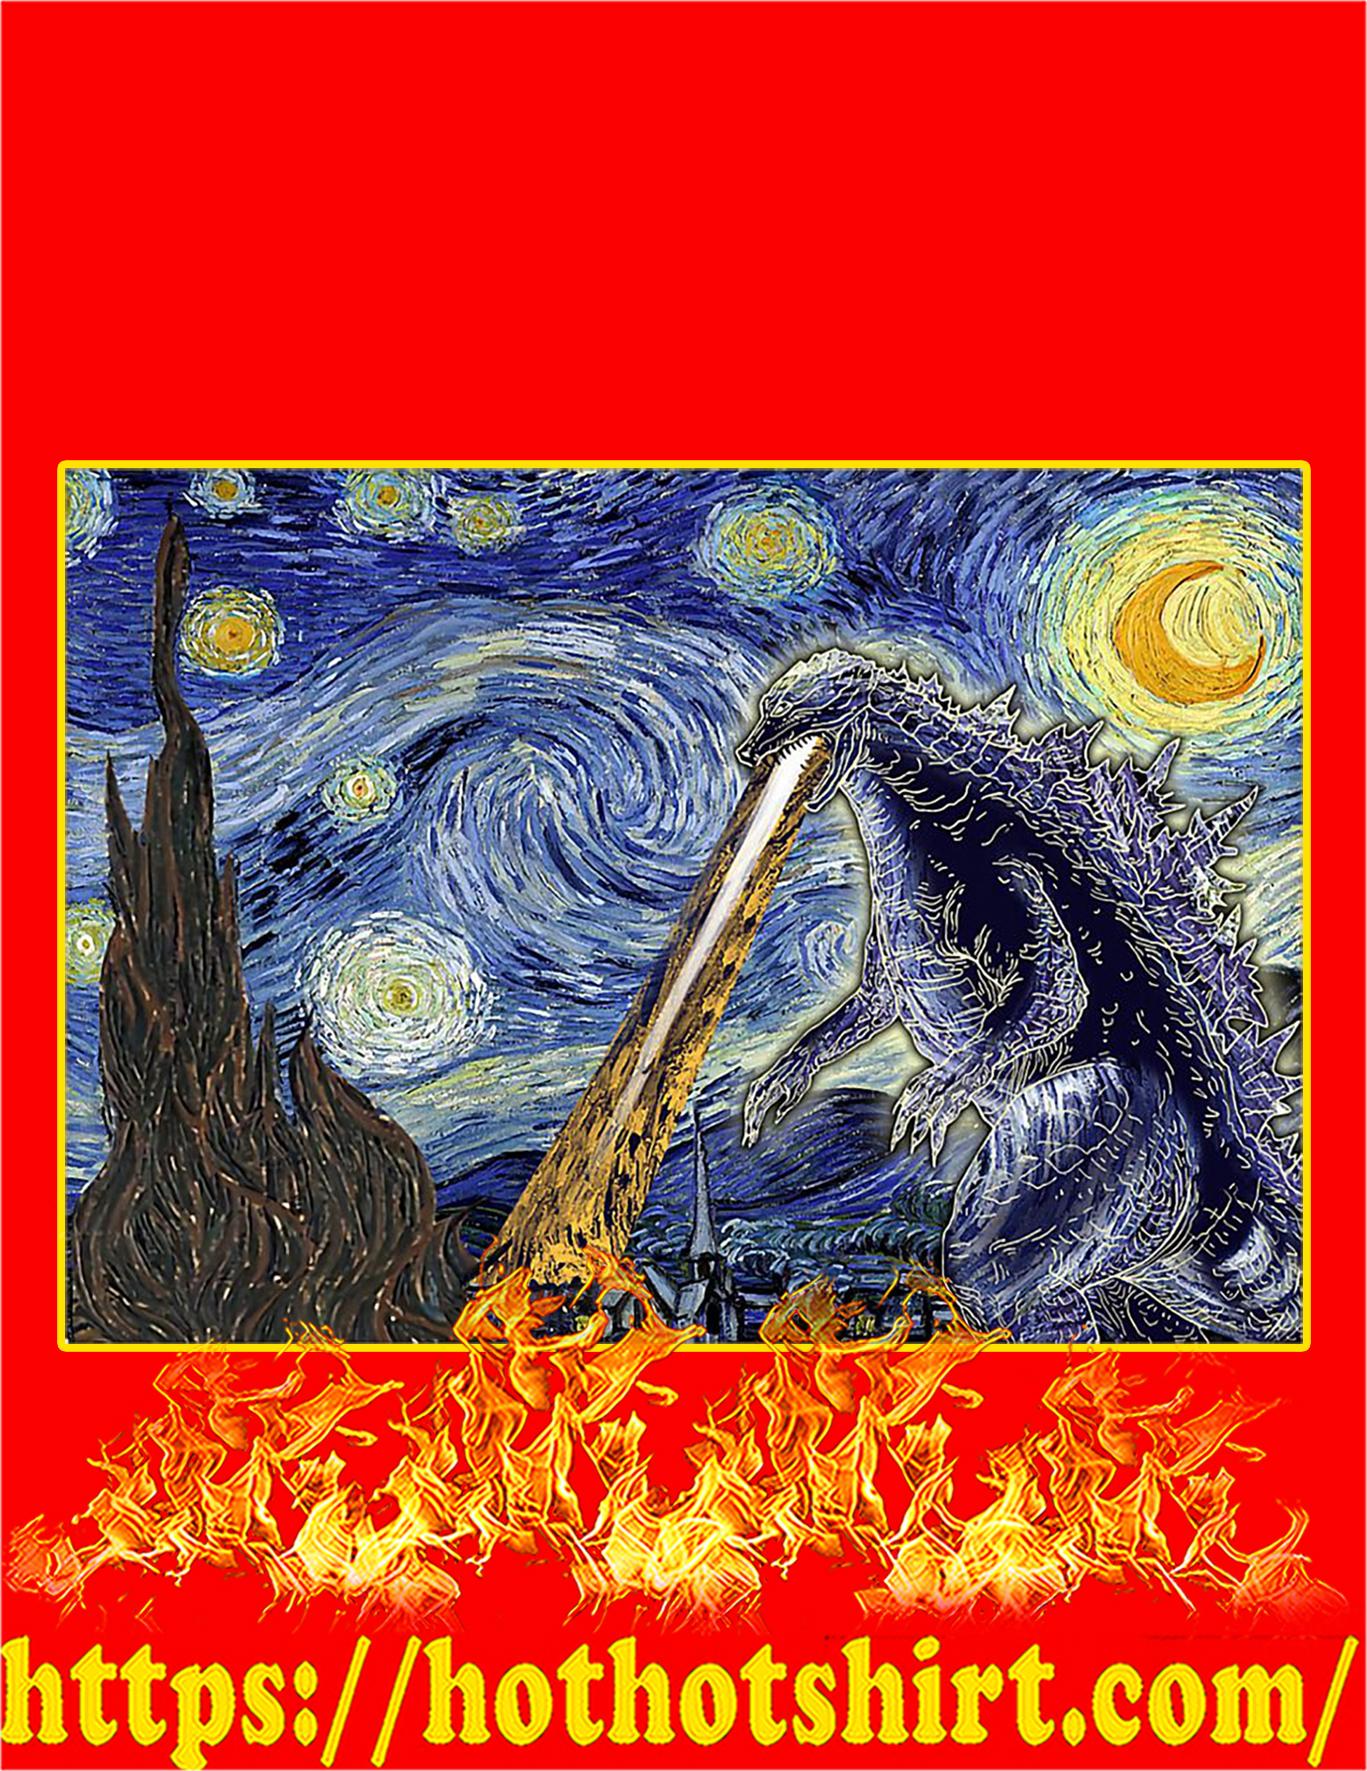 Godzilla starry night Van gogh poster - A3